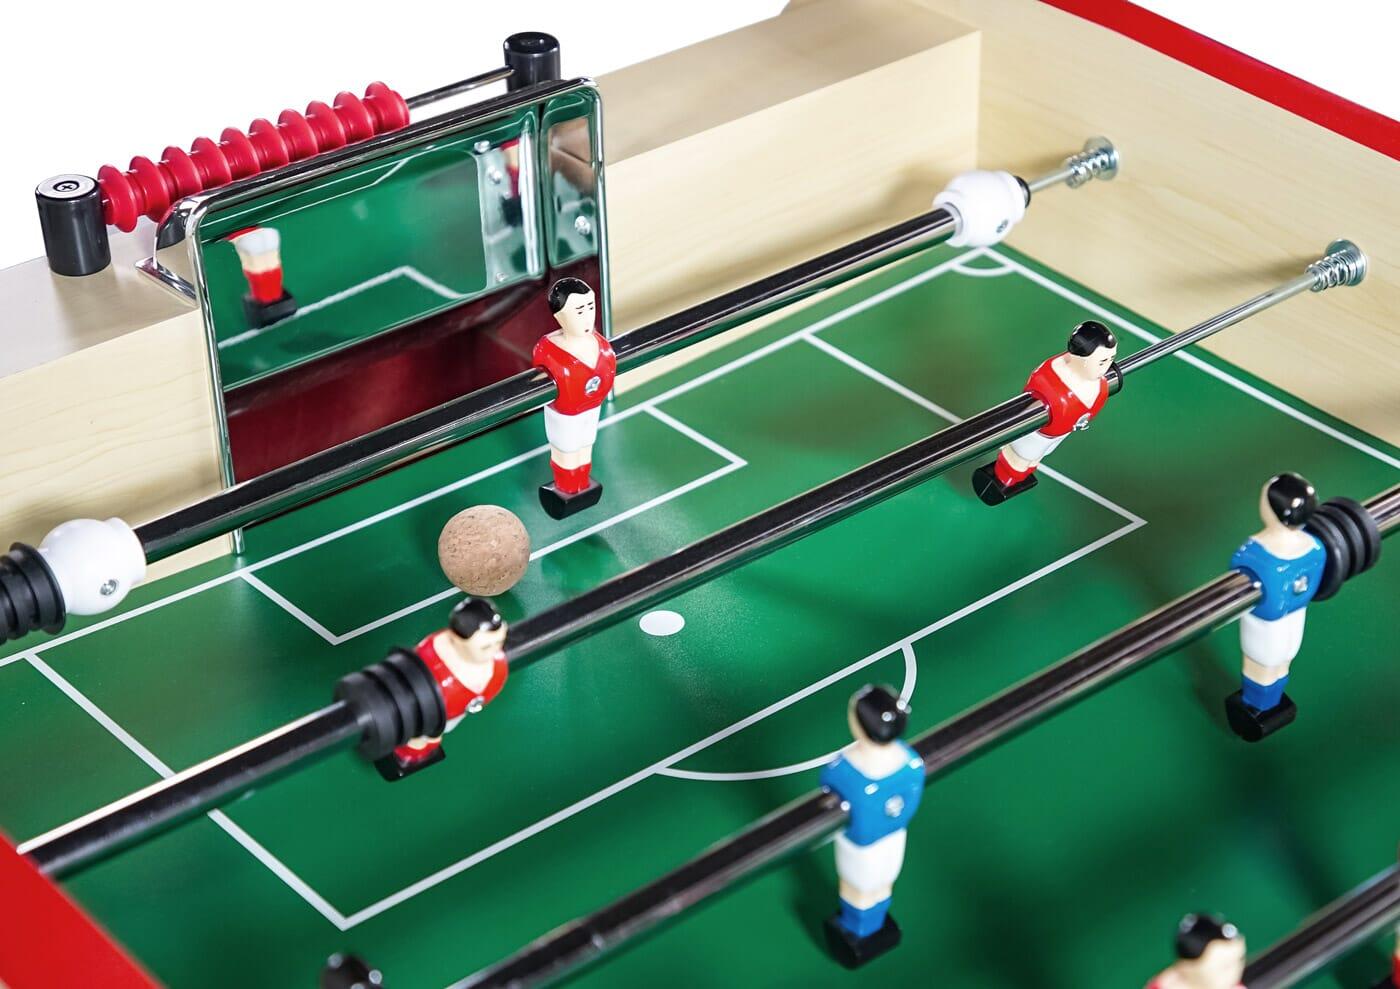 Baby-foot-Catenaccio-Campo-terrain-goal-defenseurs